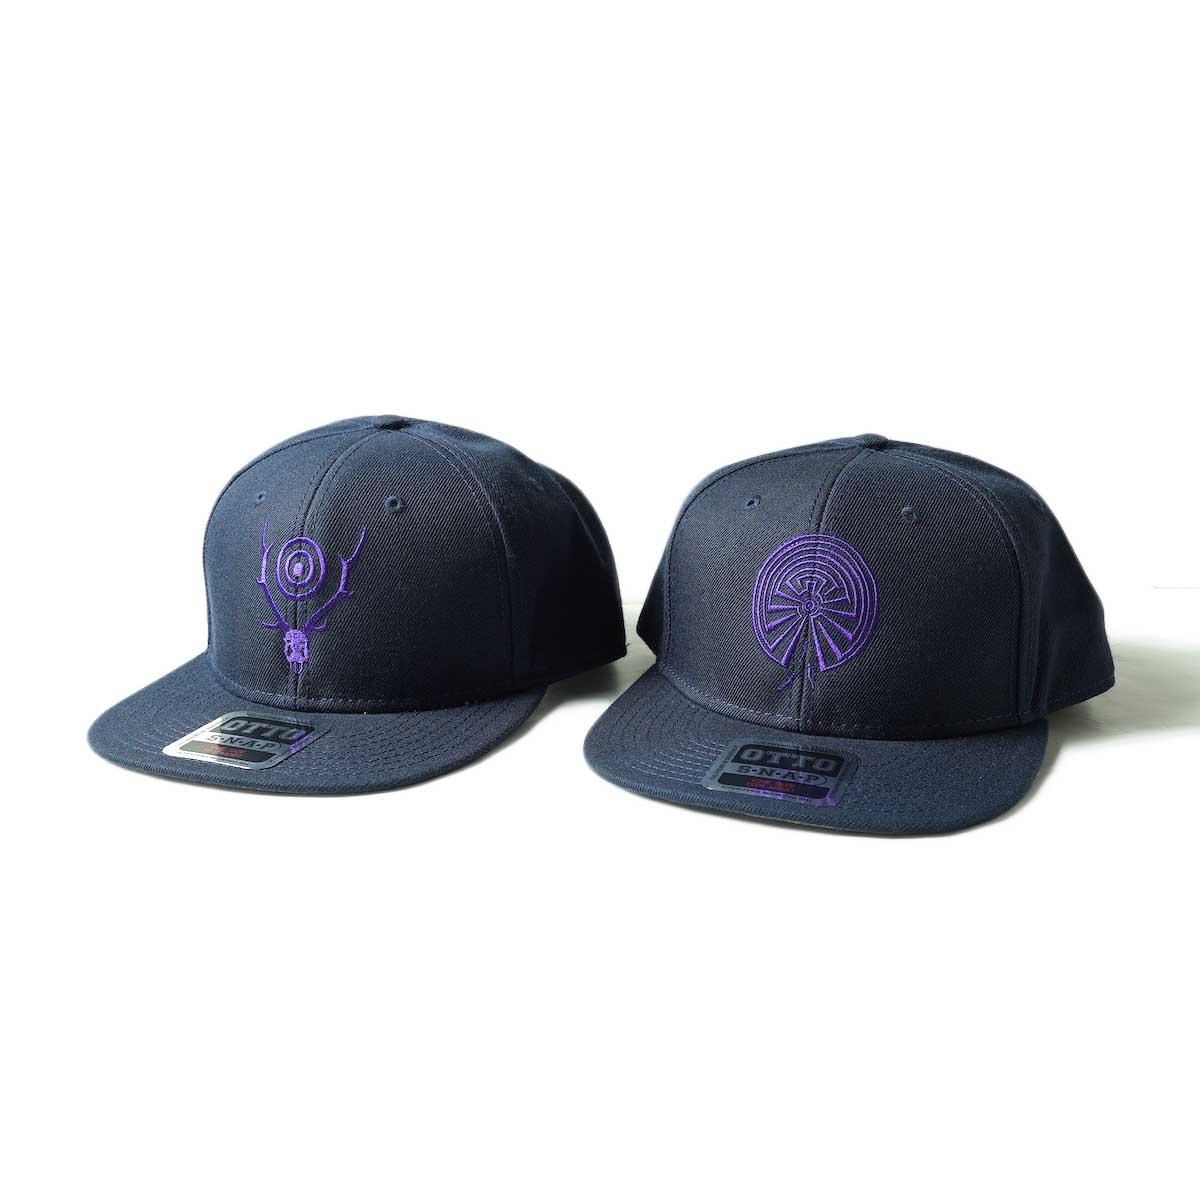 South2 West8 / BASEBALL CAP